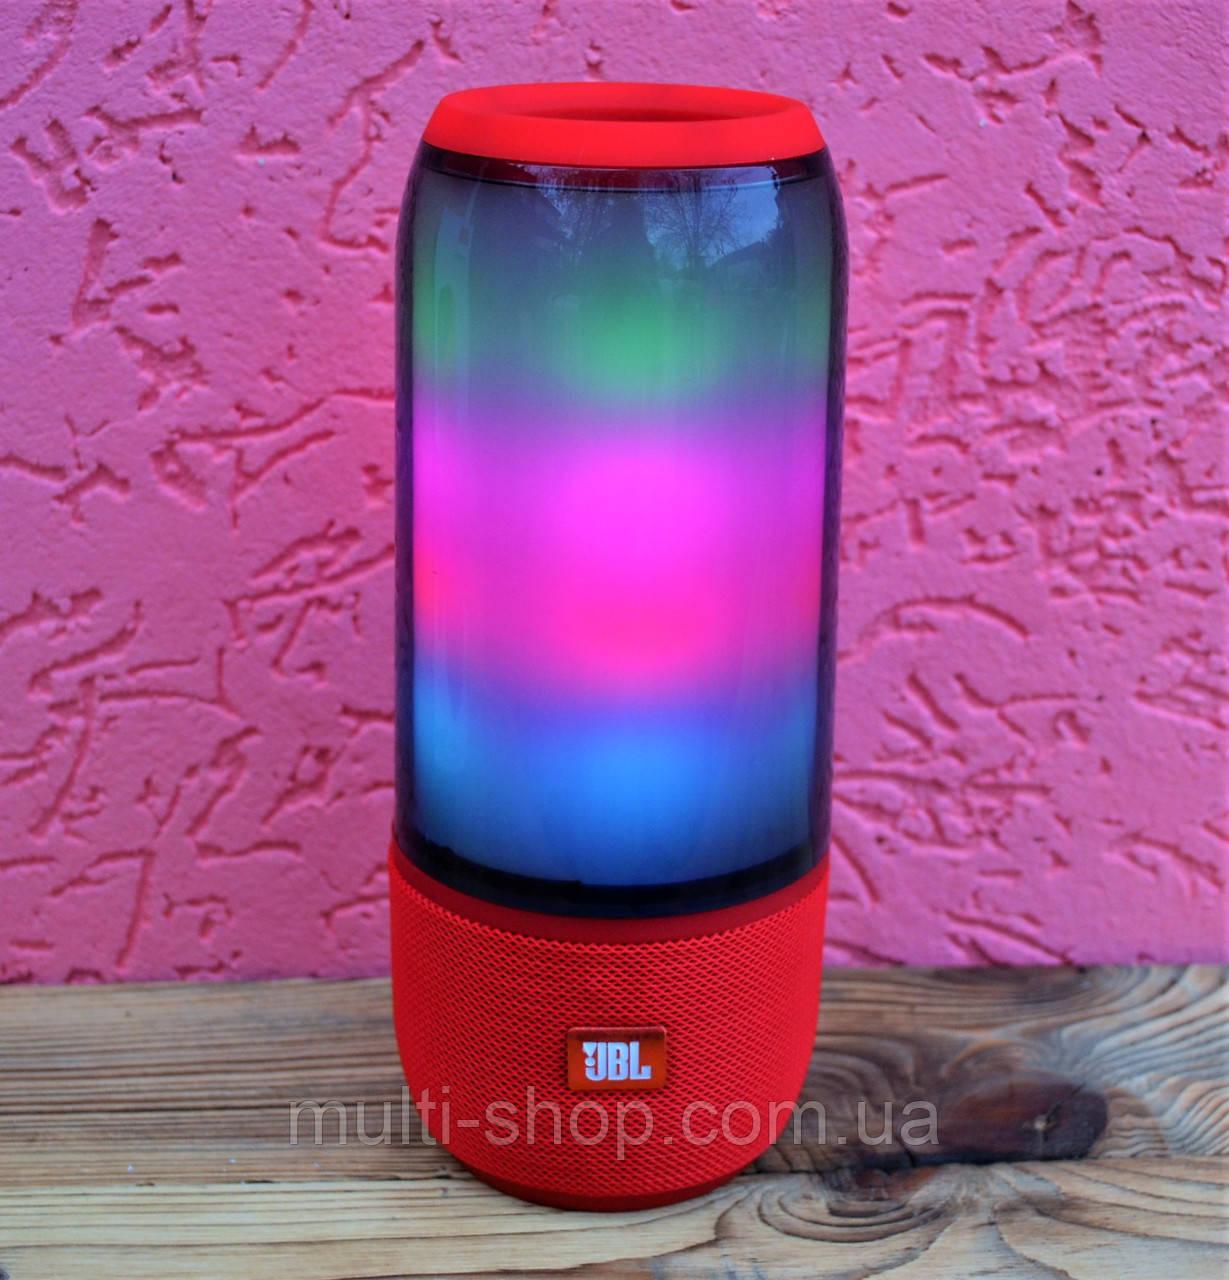 Портативная Bluetooth акустика/Колонка в стиле JBL Pulse 3 с цветомузыкой